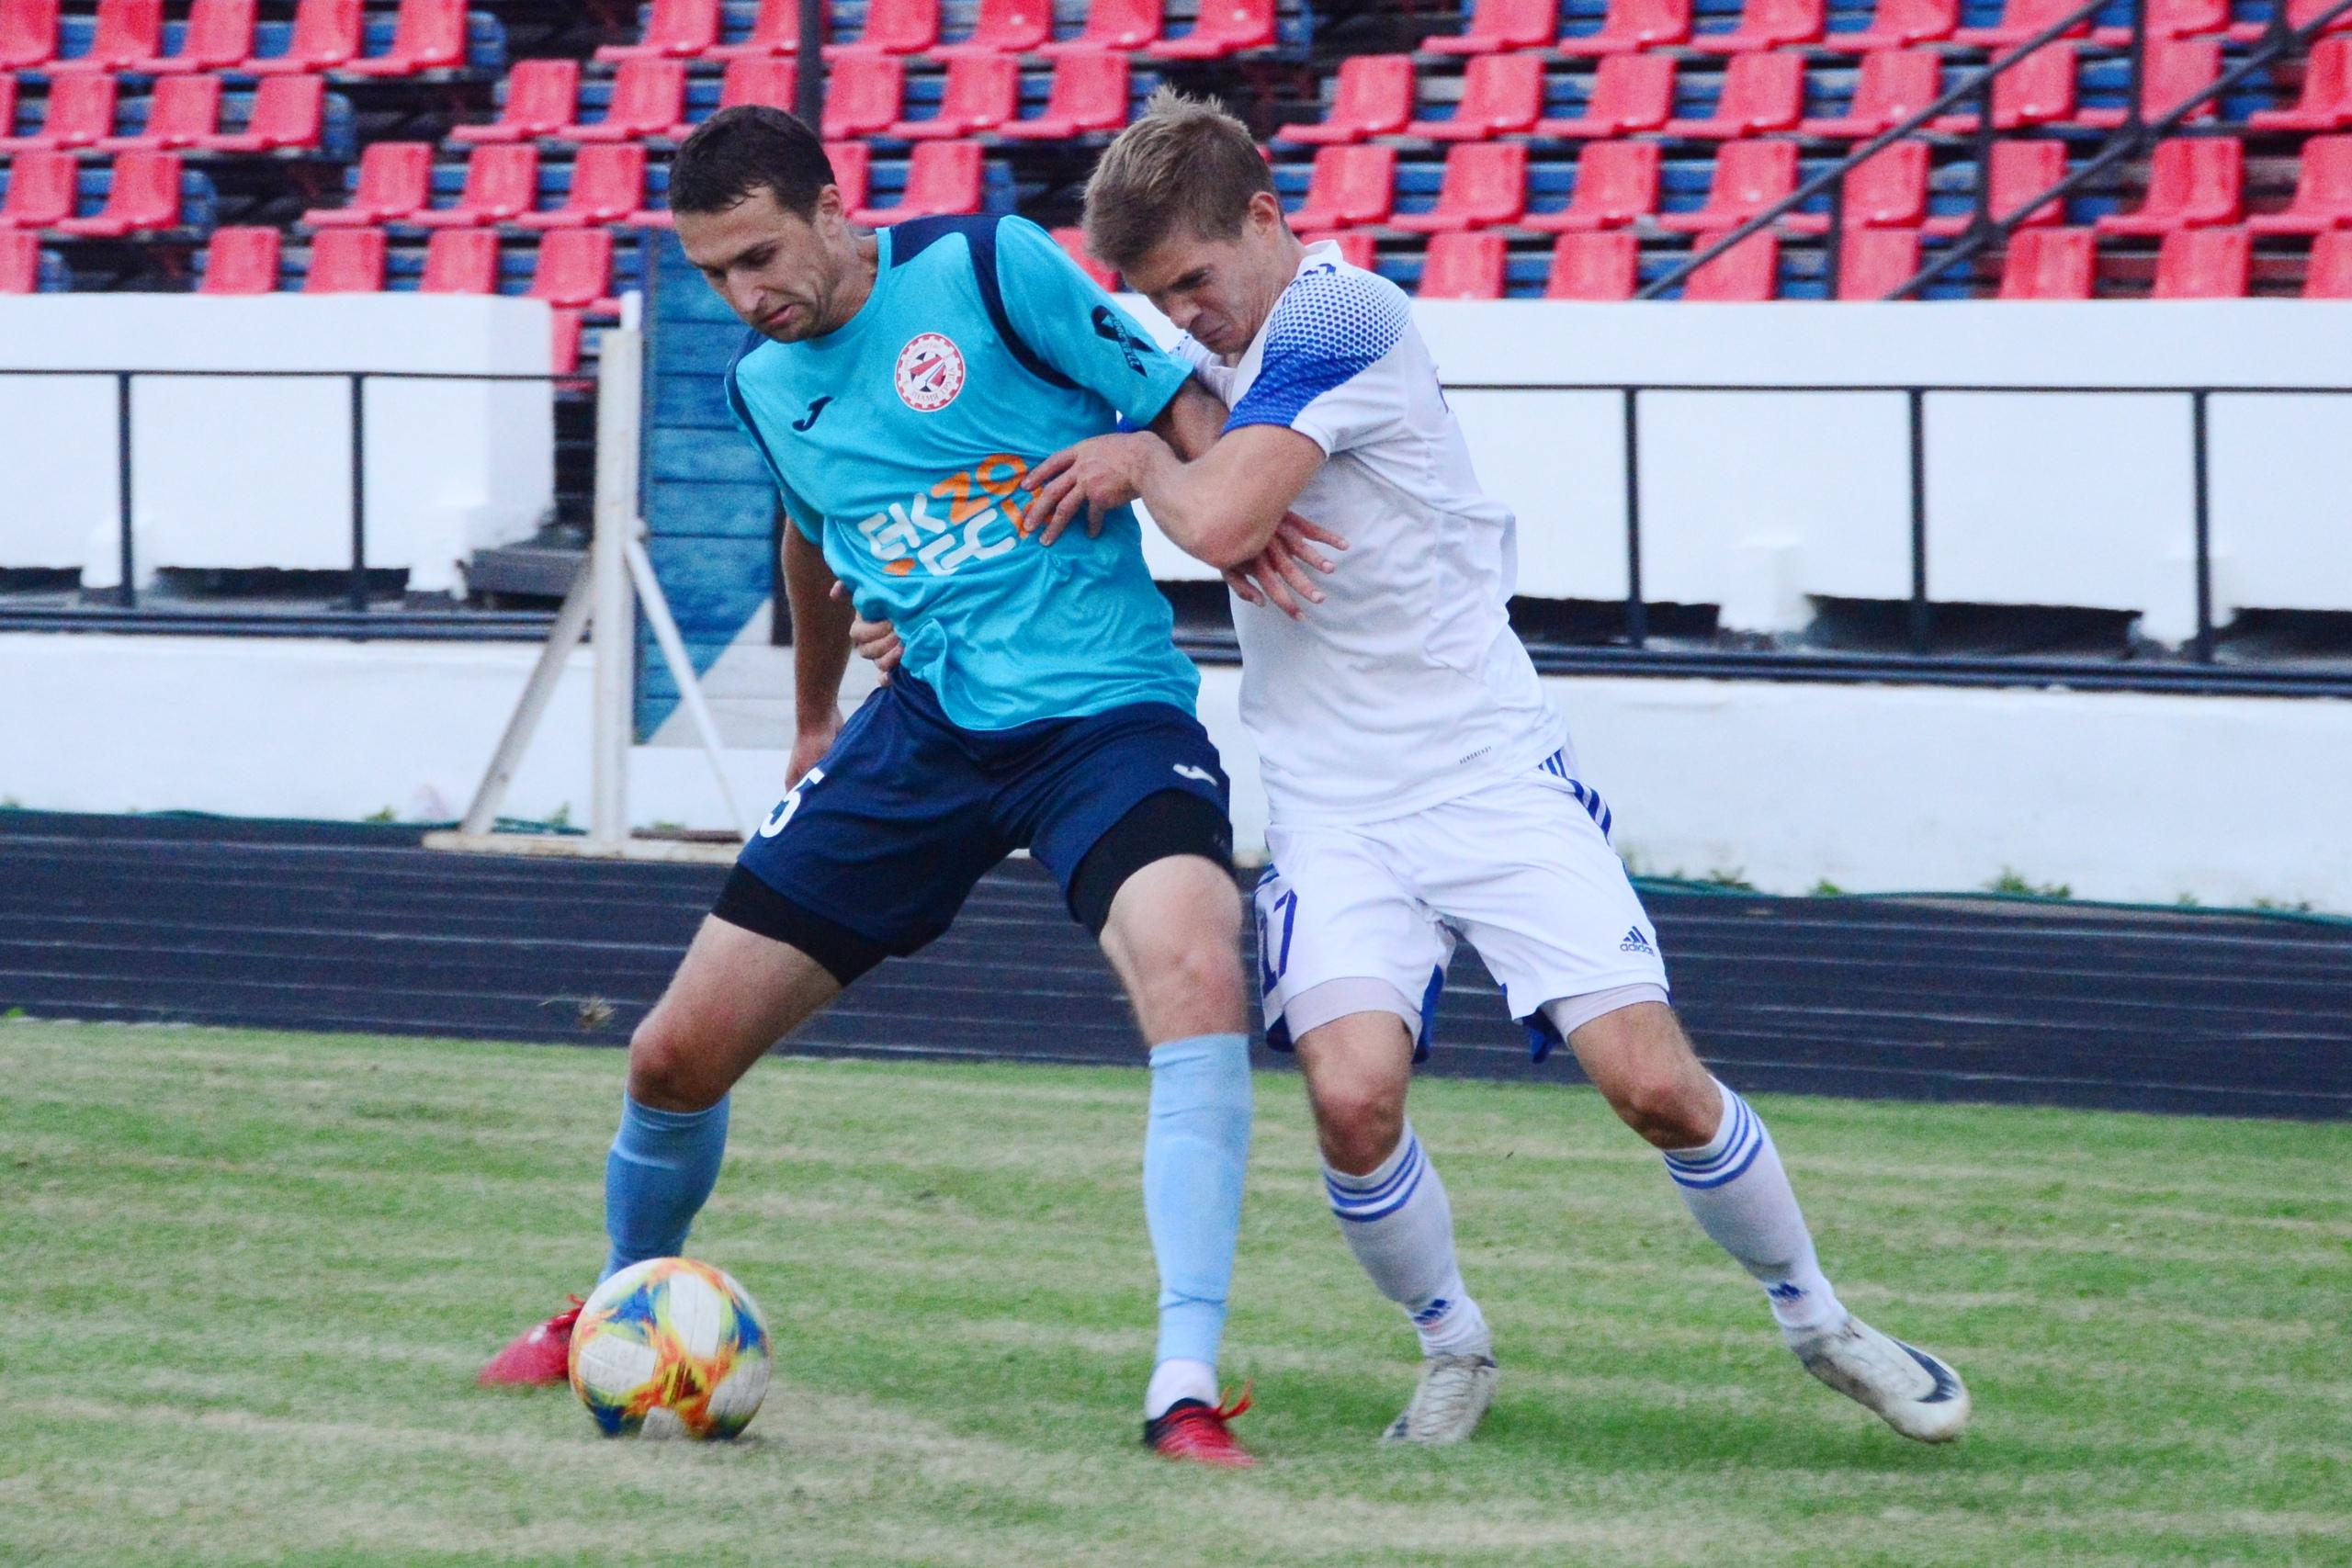 Николай Вовк и Максим Гайдуков. Фото: Зенит Иркутск